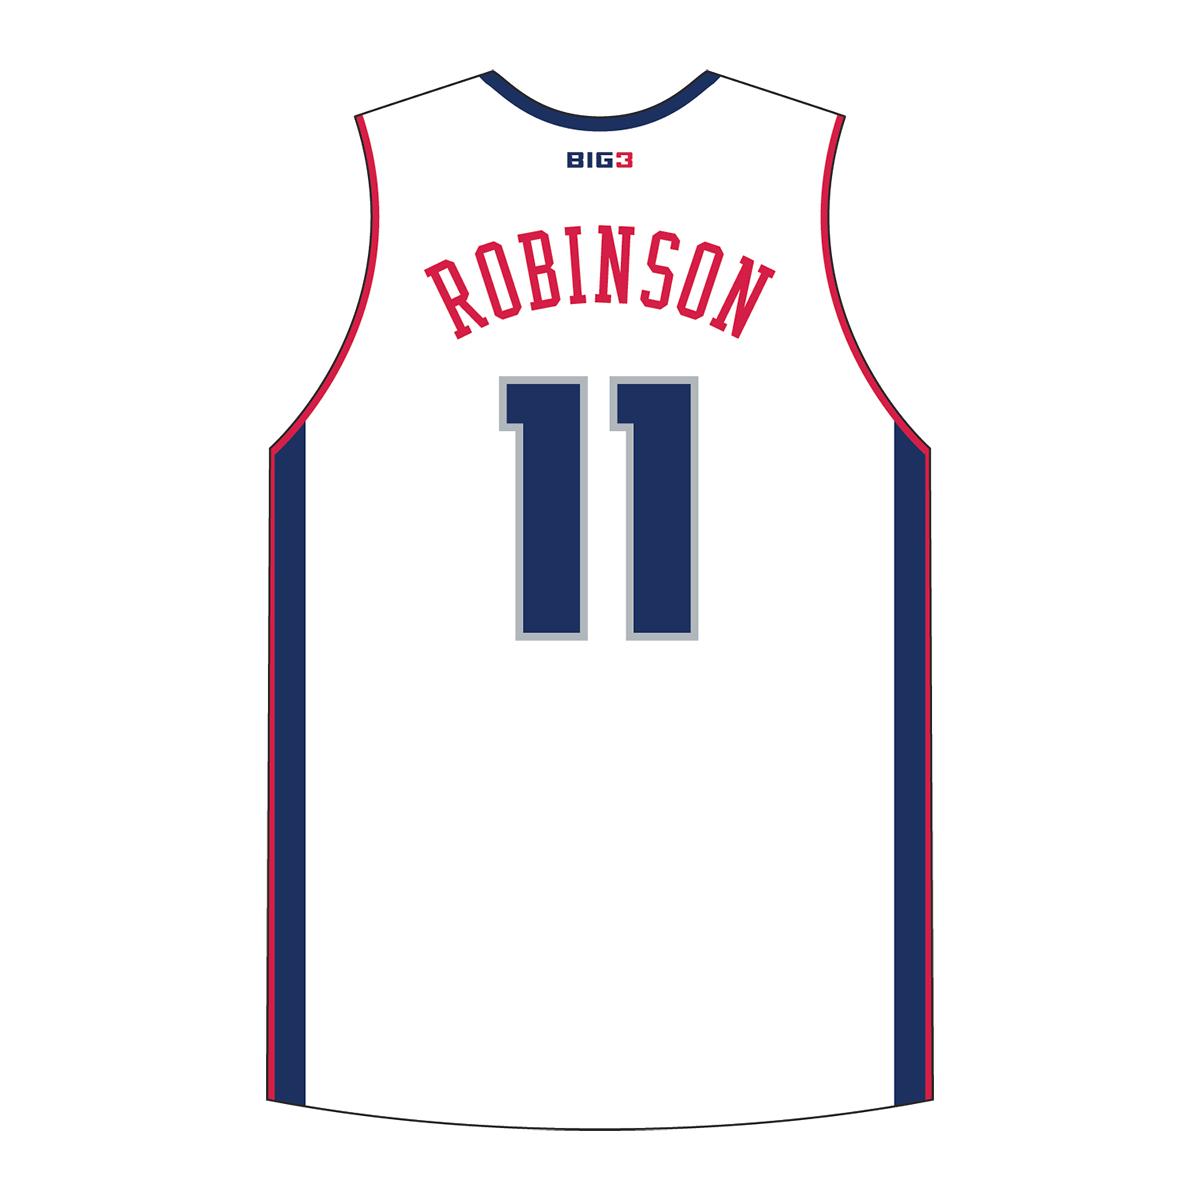 Robinson Jersey